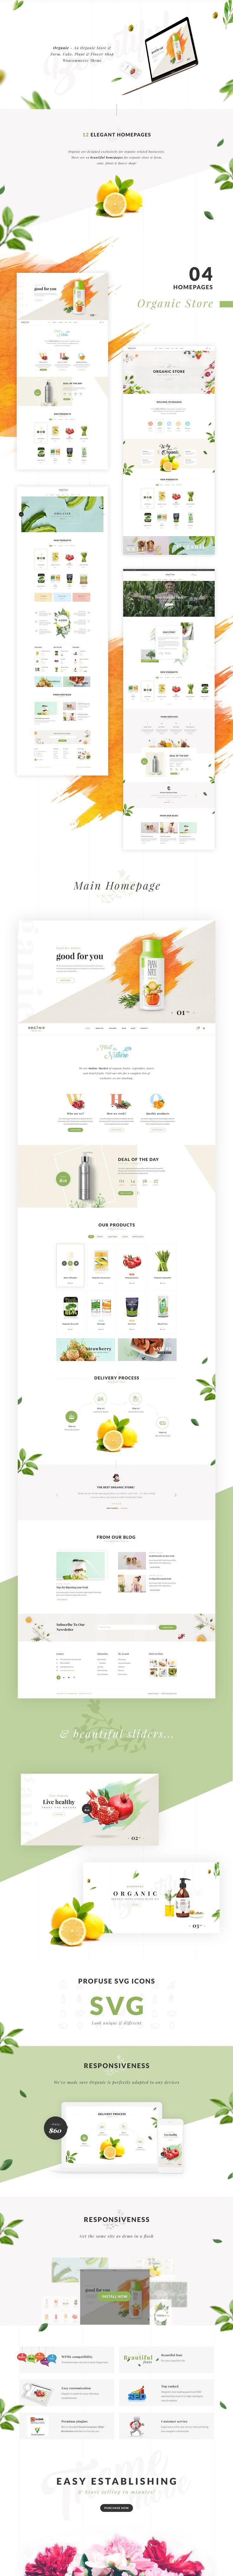 Organie - A Delightful Organic Store WooCommerce Theme on Behance